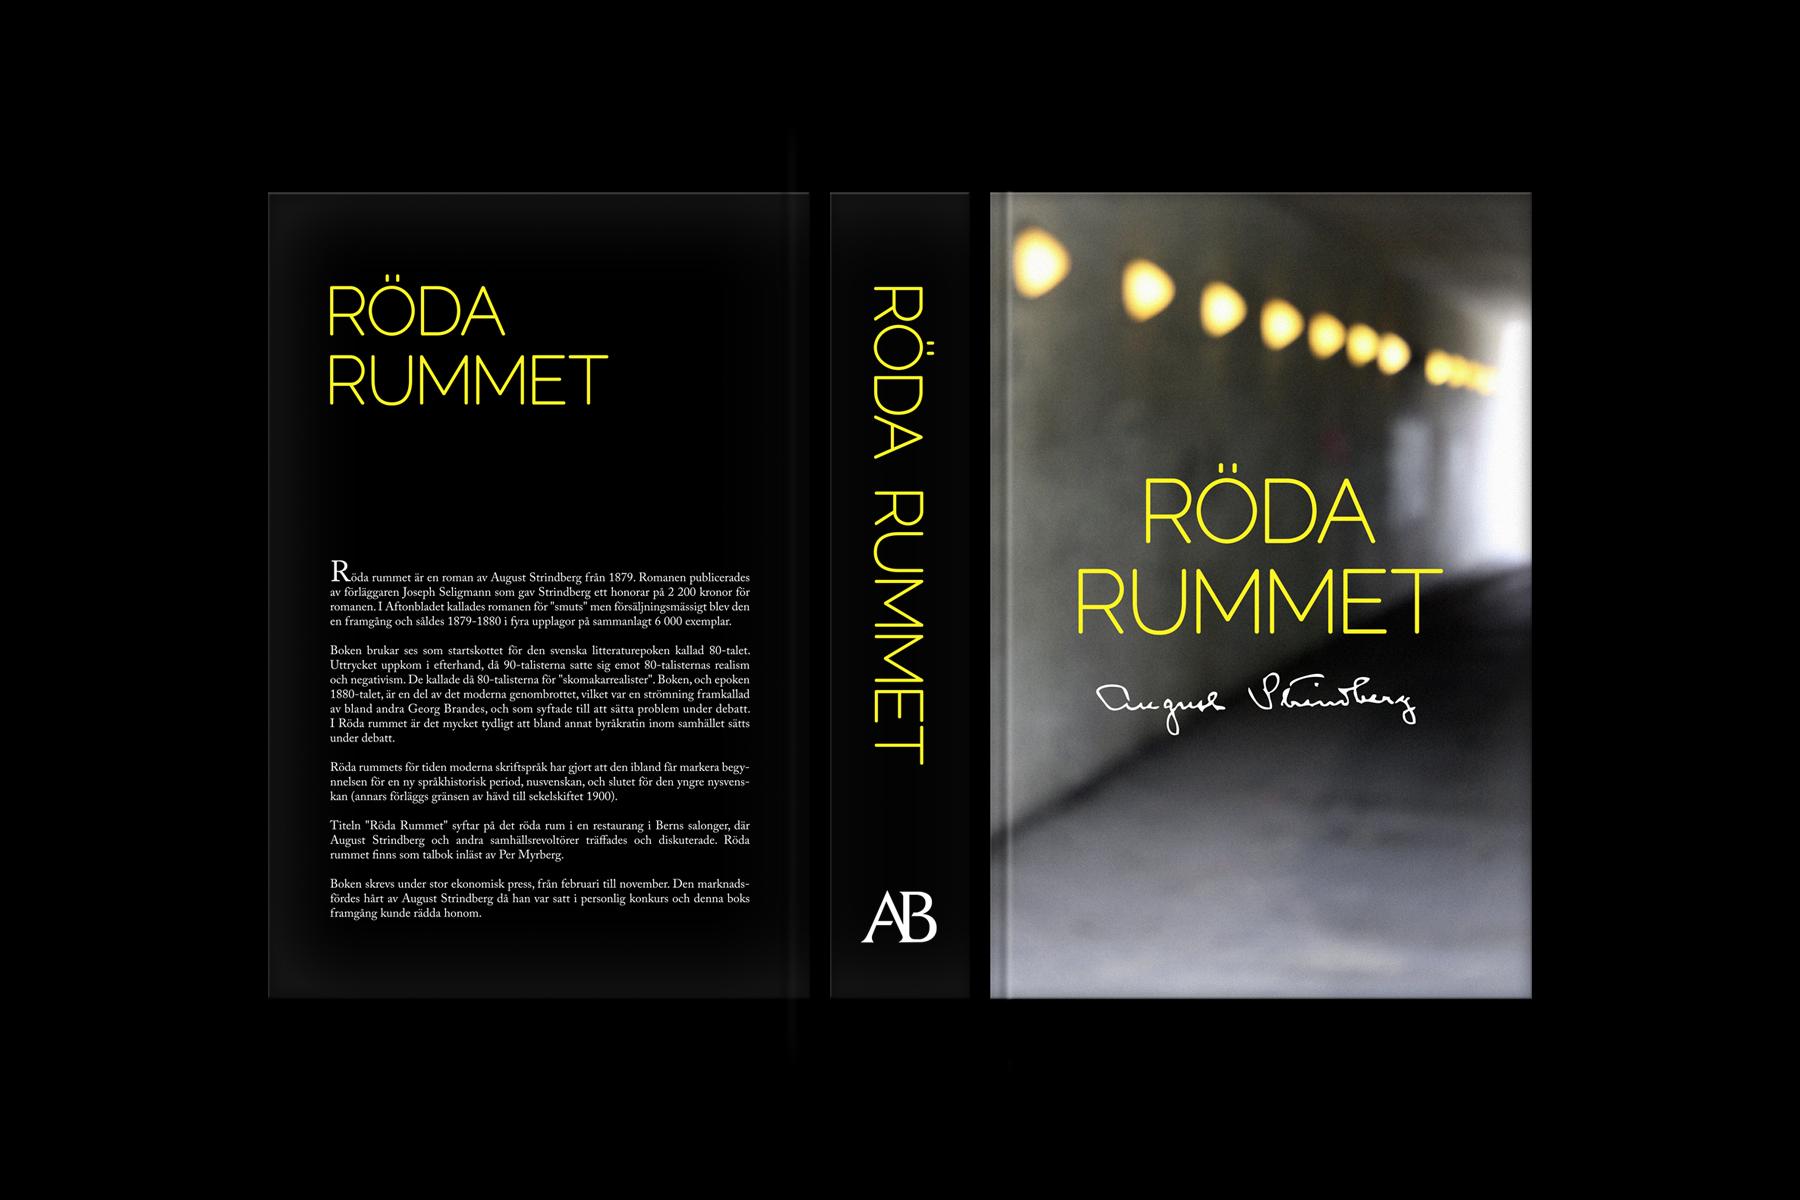 Martin_Liljesand_Strindberg_Roda_Rummet.jpg